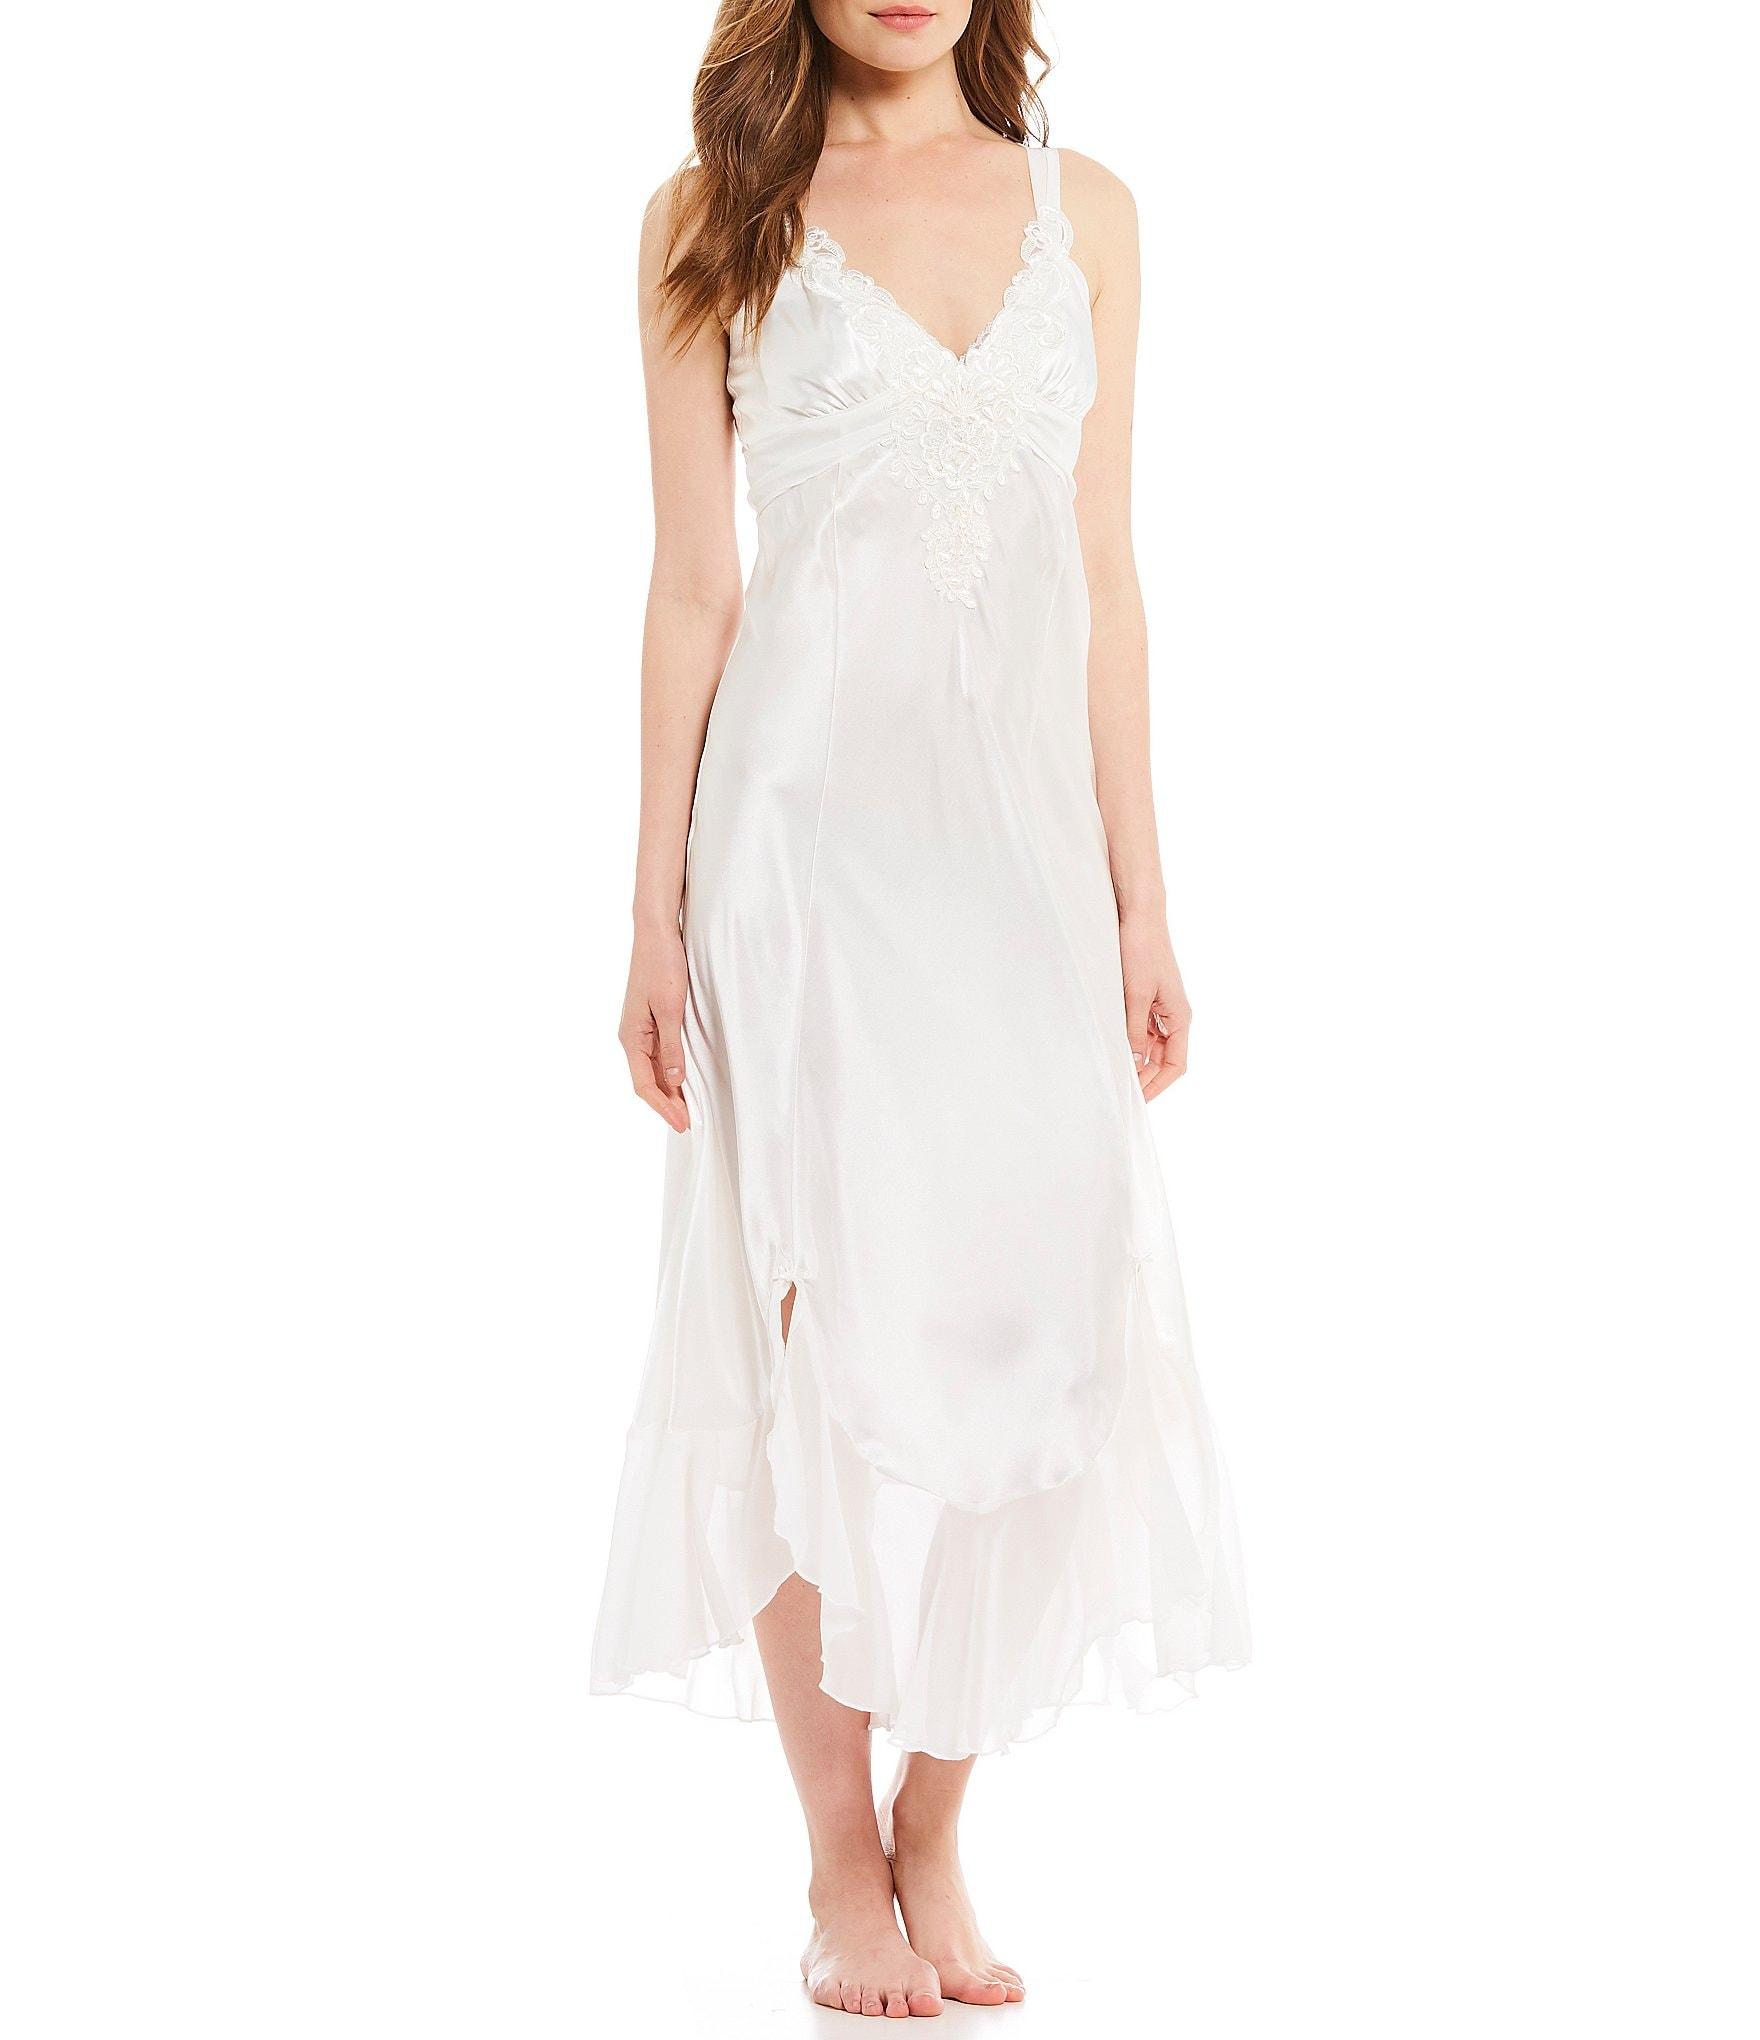 Bridal & Wedding Lingerie | Dillards